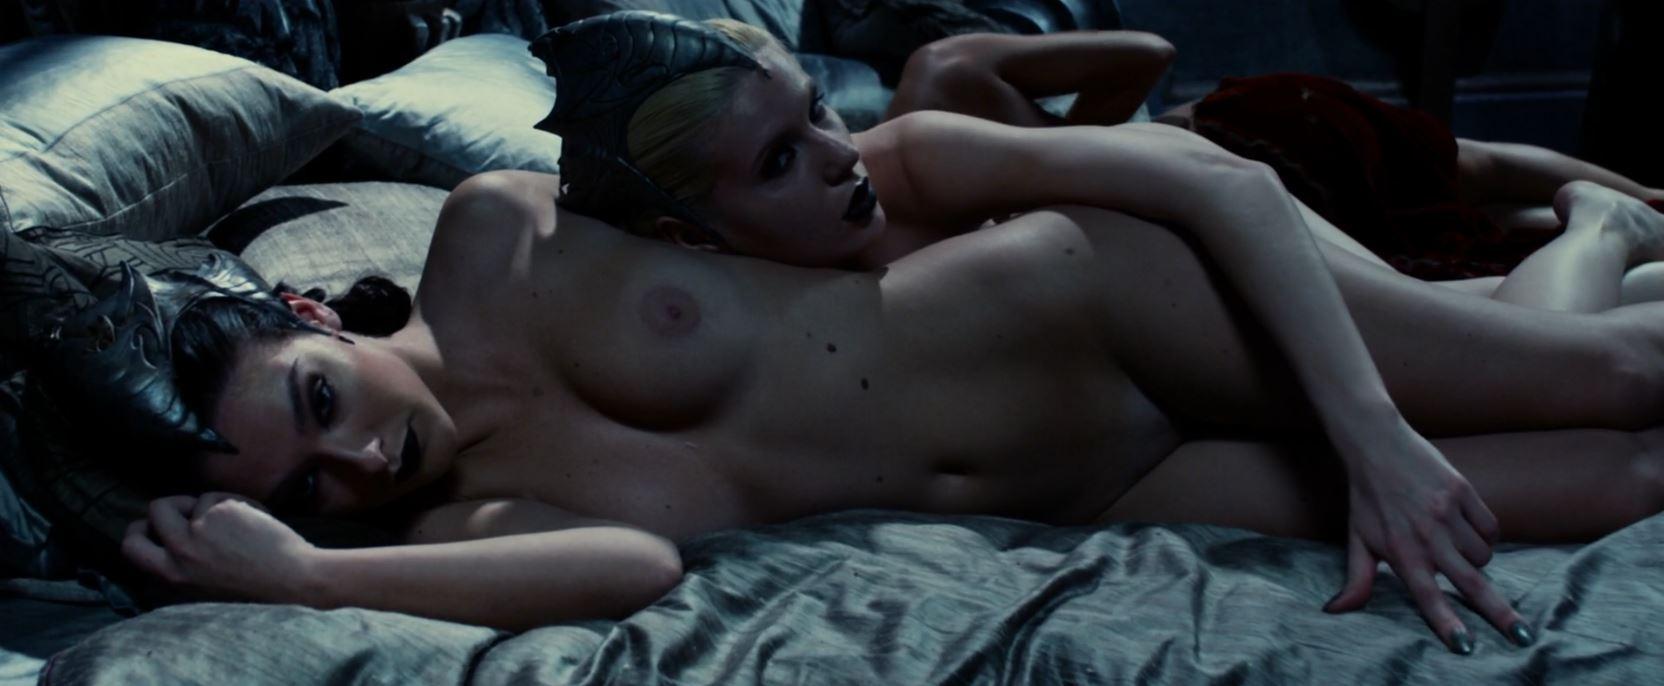 Milf creampie cumshot video naked pictures 2018